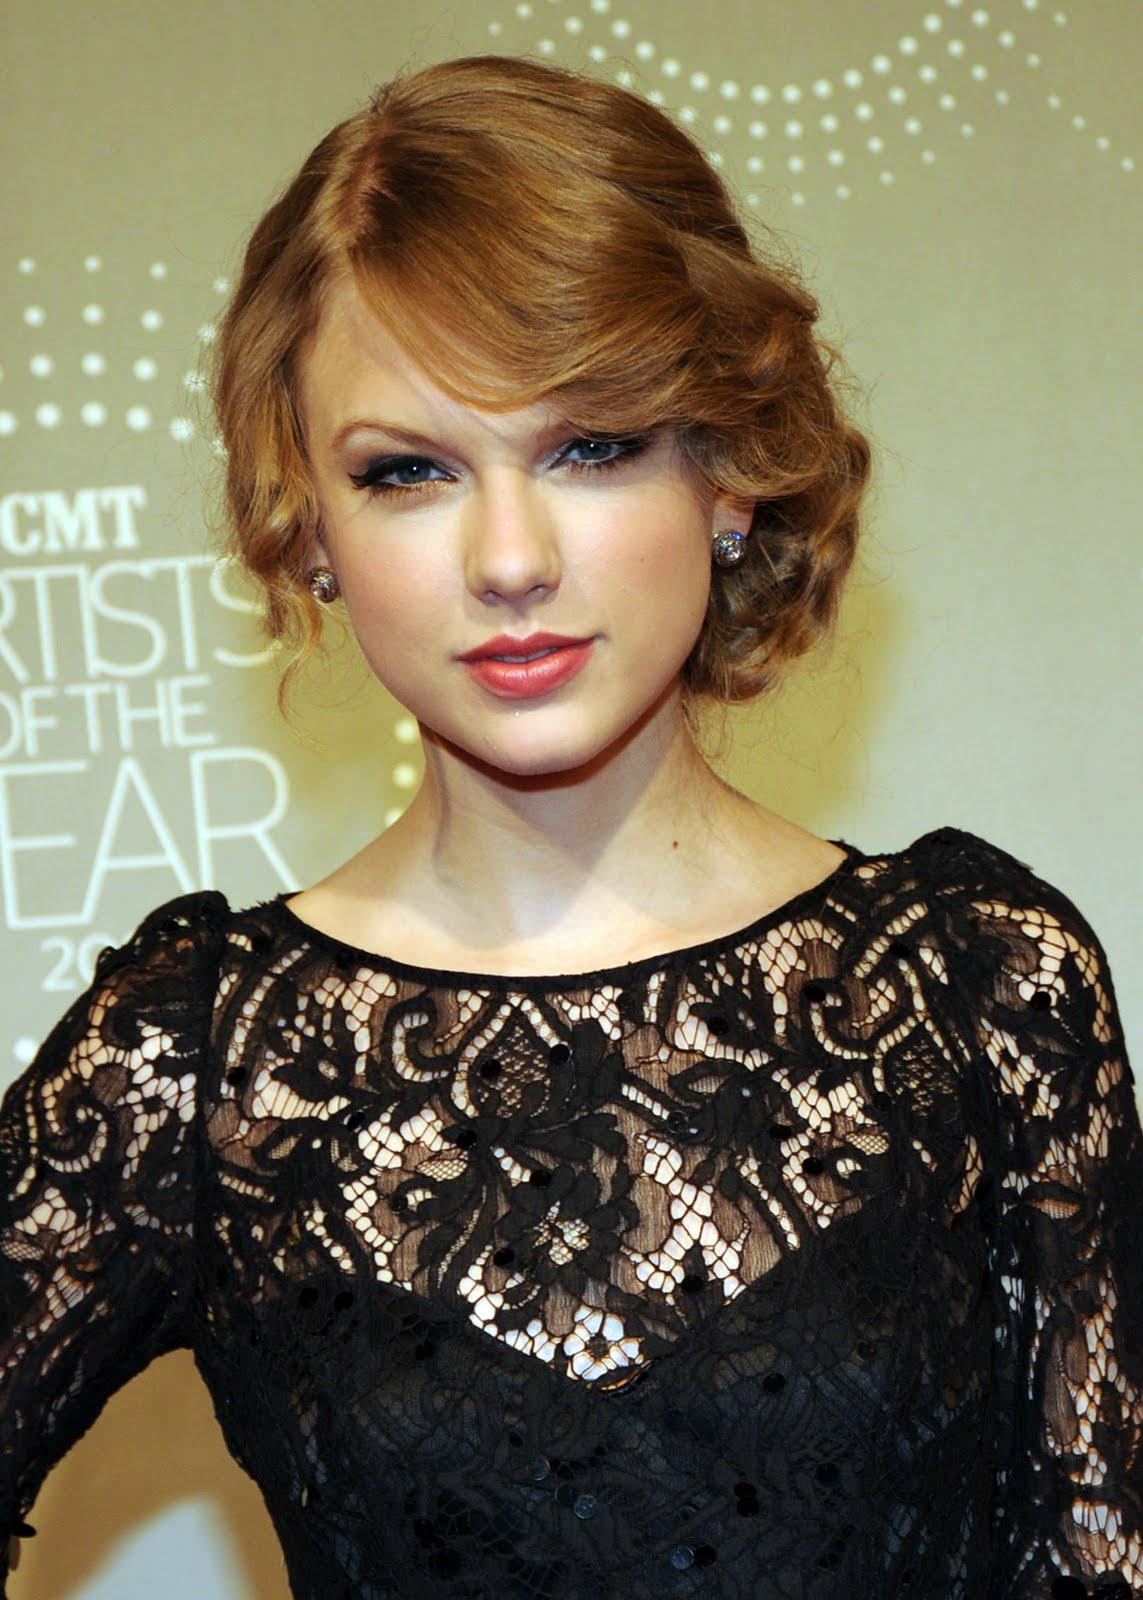 taylor-swift-strawberry-blonde-hair.jpeg